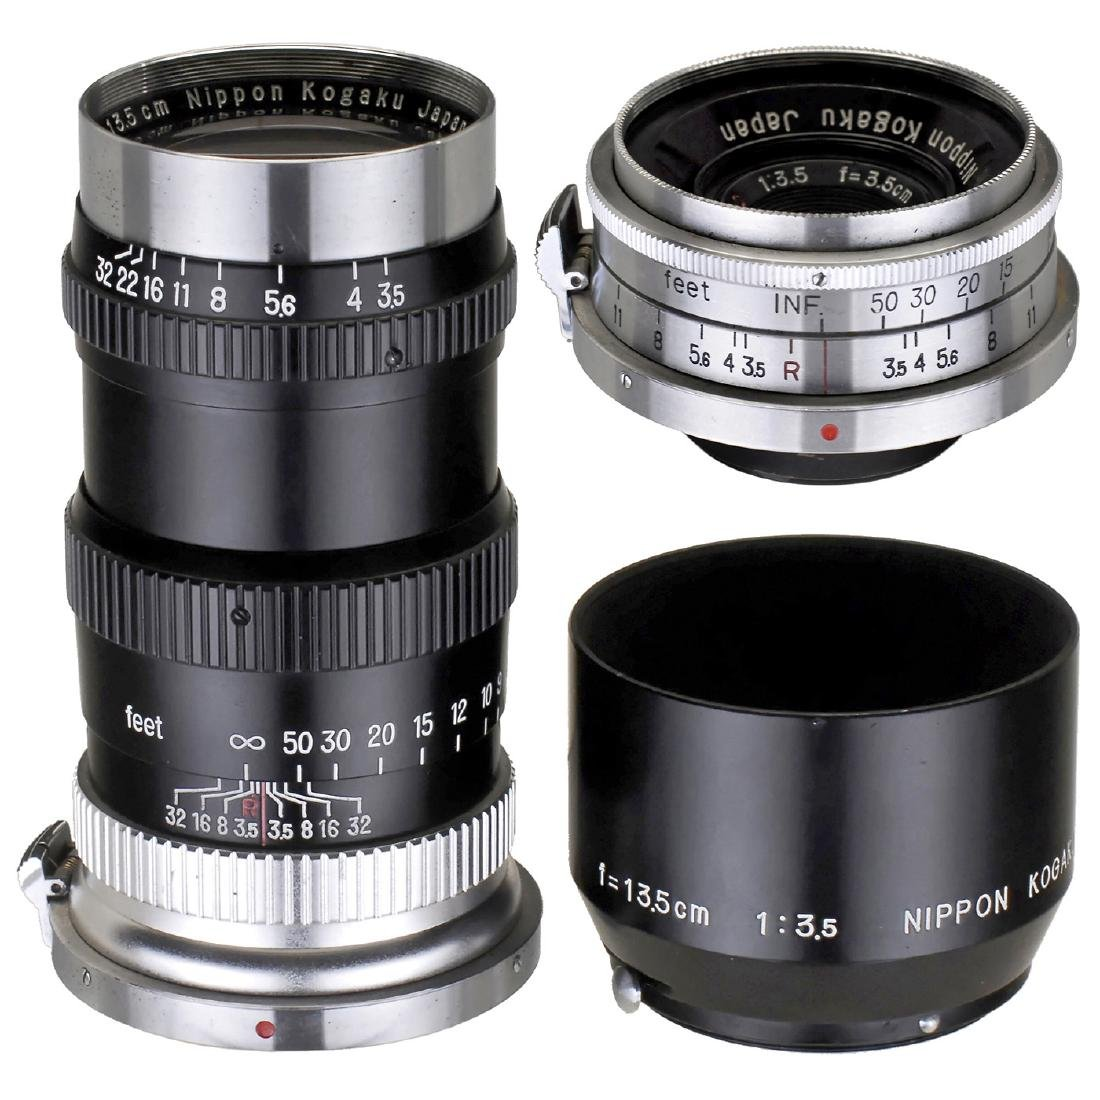 W-Nikkor C 3,5/3,5 cm and Nikkor-Q. C 3,5/13,5 cm (for